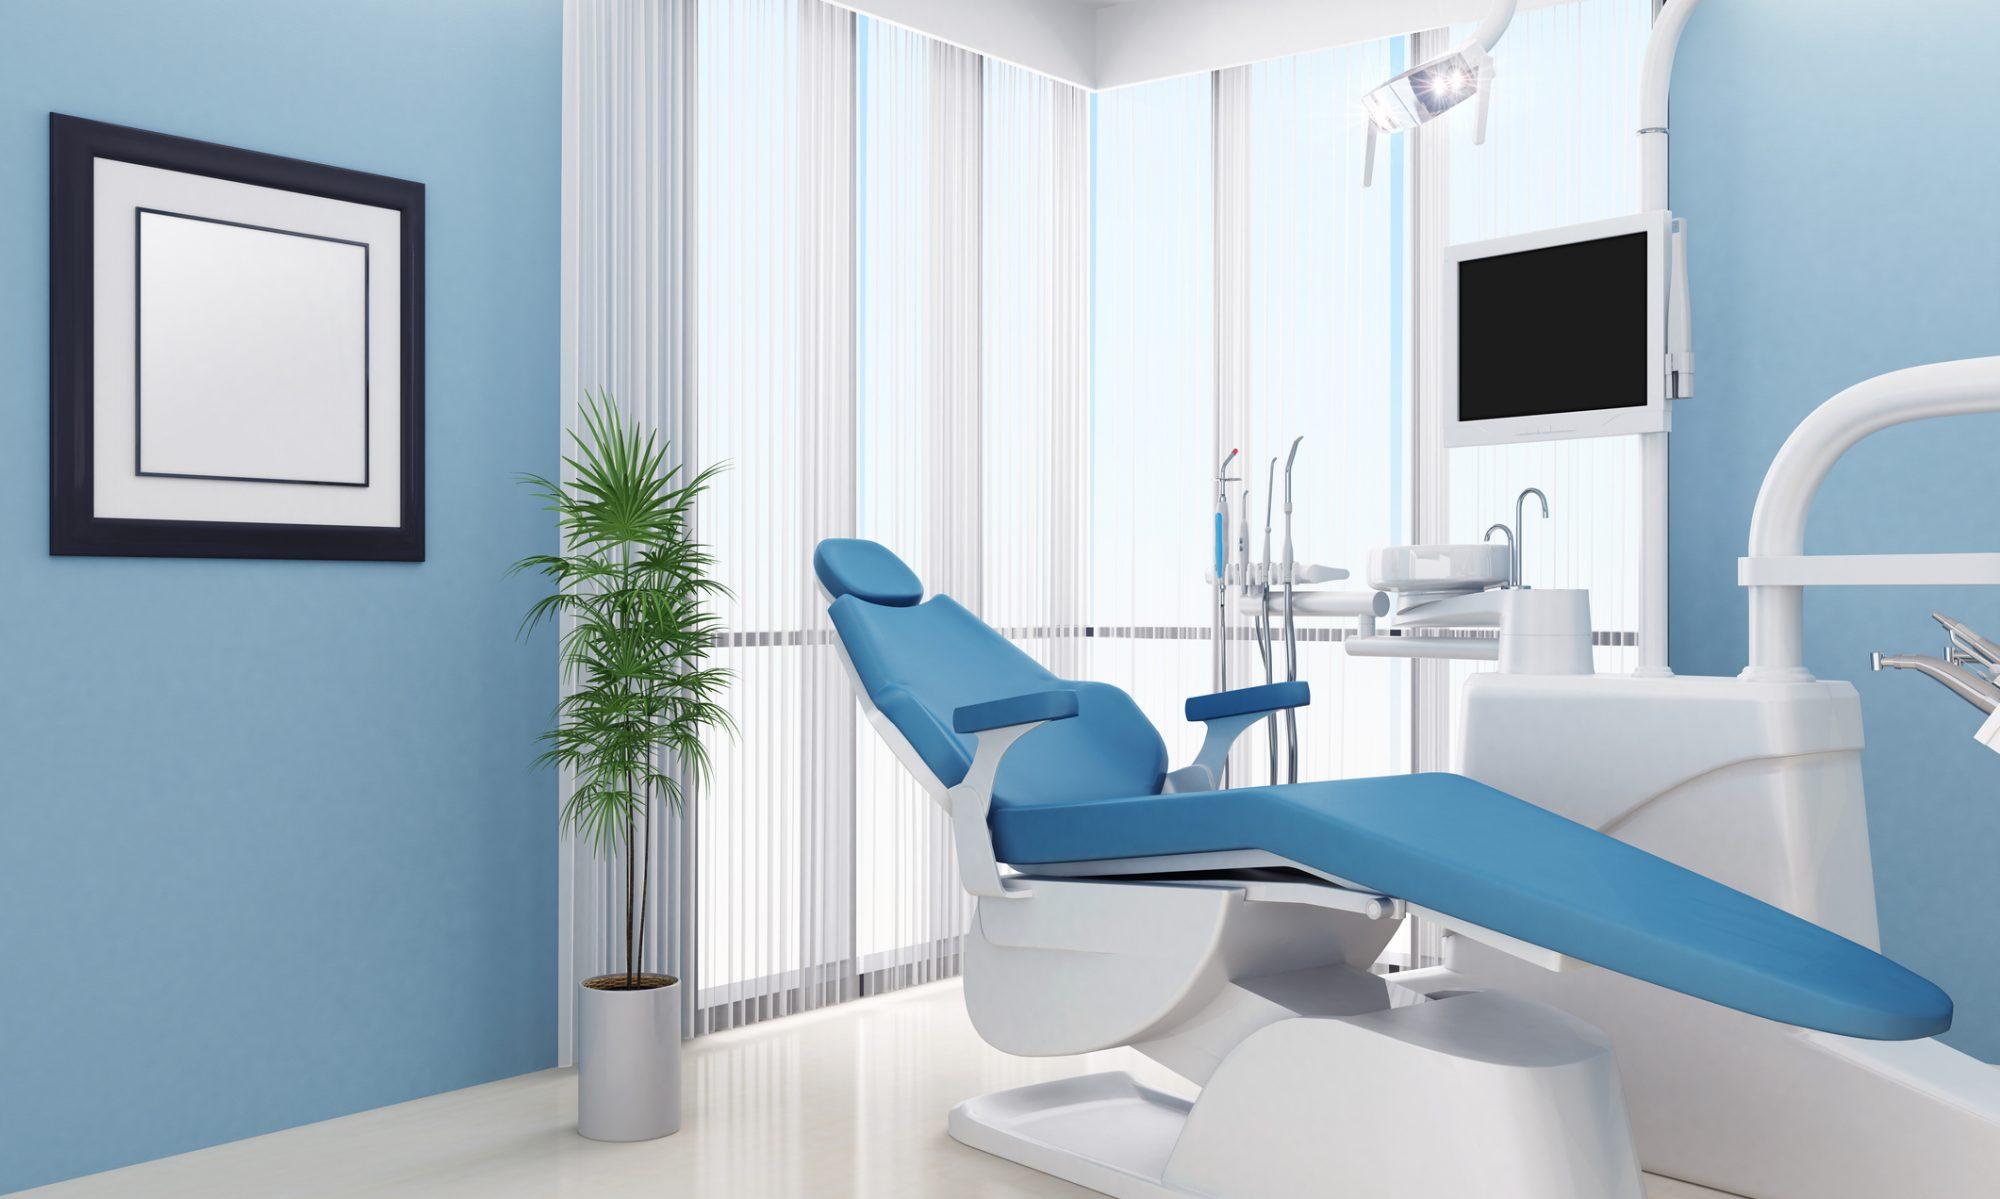 Dentist - מרפאת שיניים